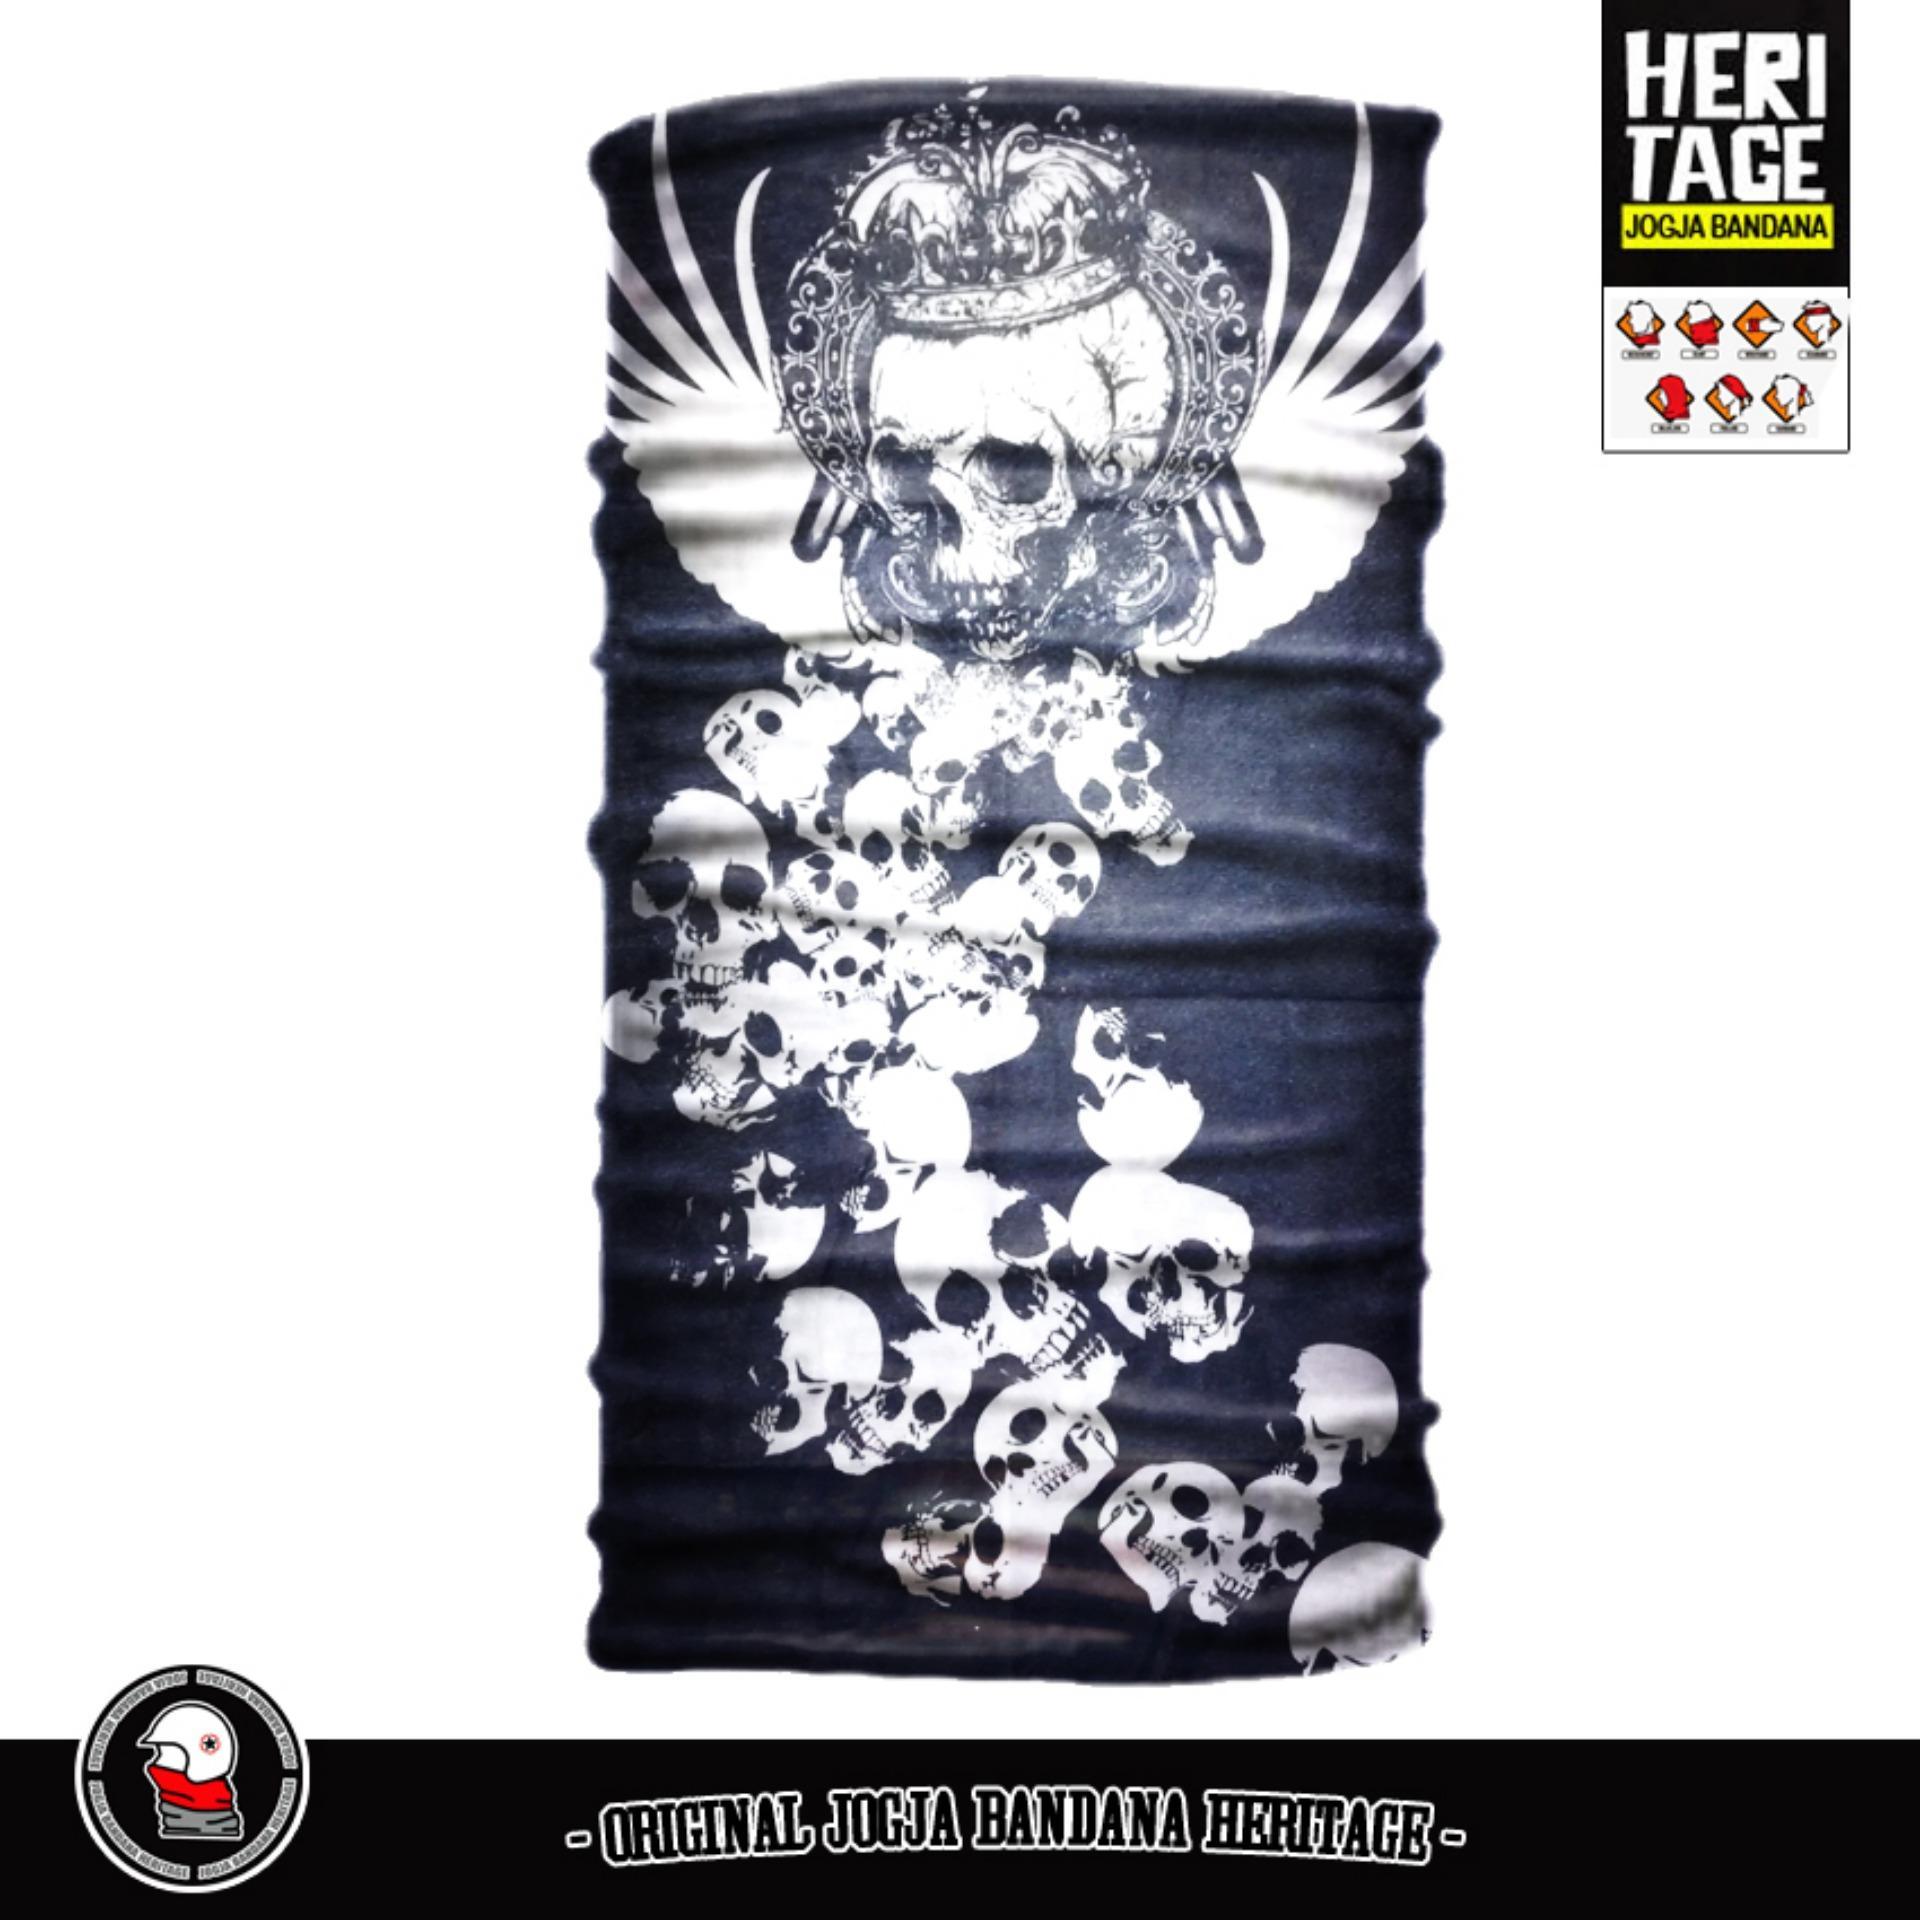 Belanja Murah Buff Bandana Masker Serbaguna Elastis Tanpa Sambungan Seamless Limited Edition